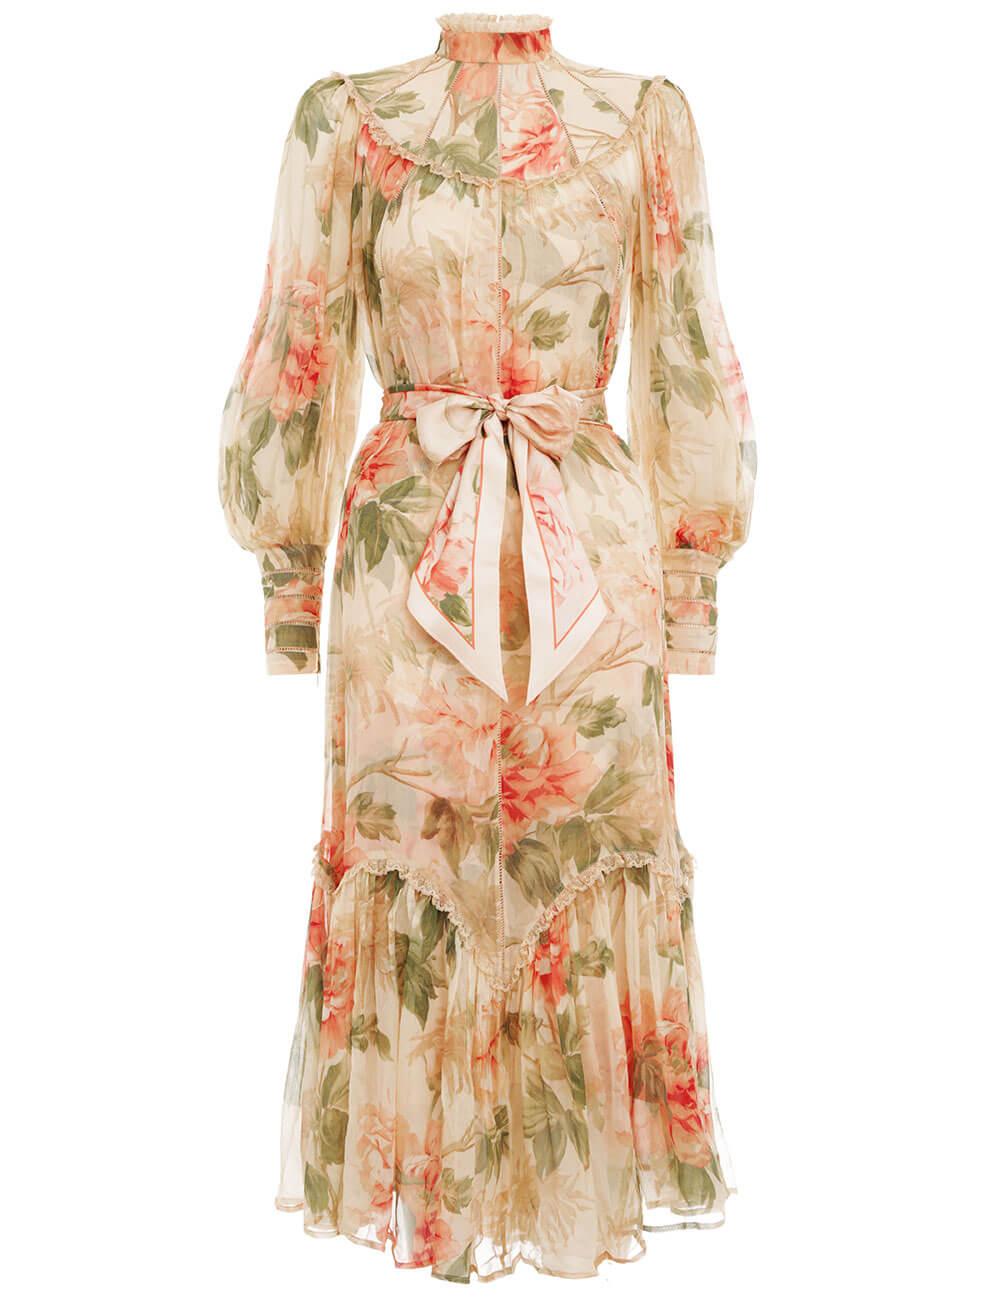 8c15d591e Shop Designer Dresses Online | ZIMMERMANN